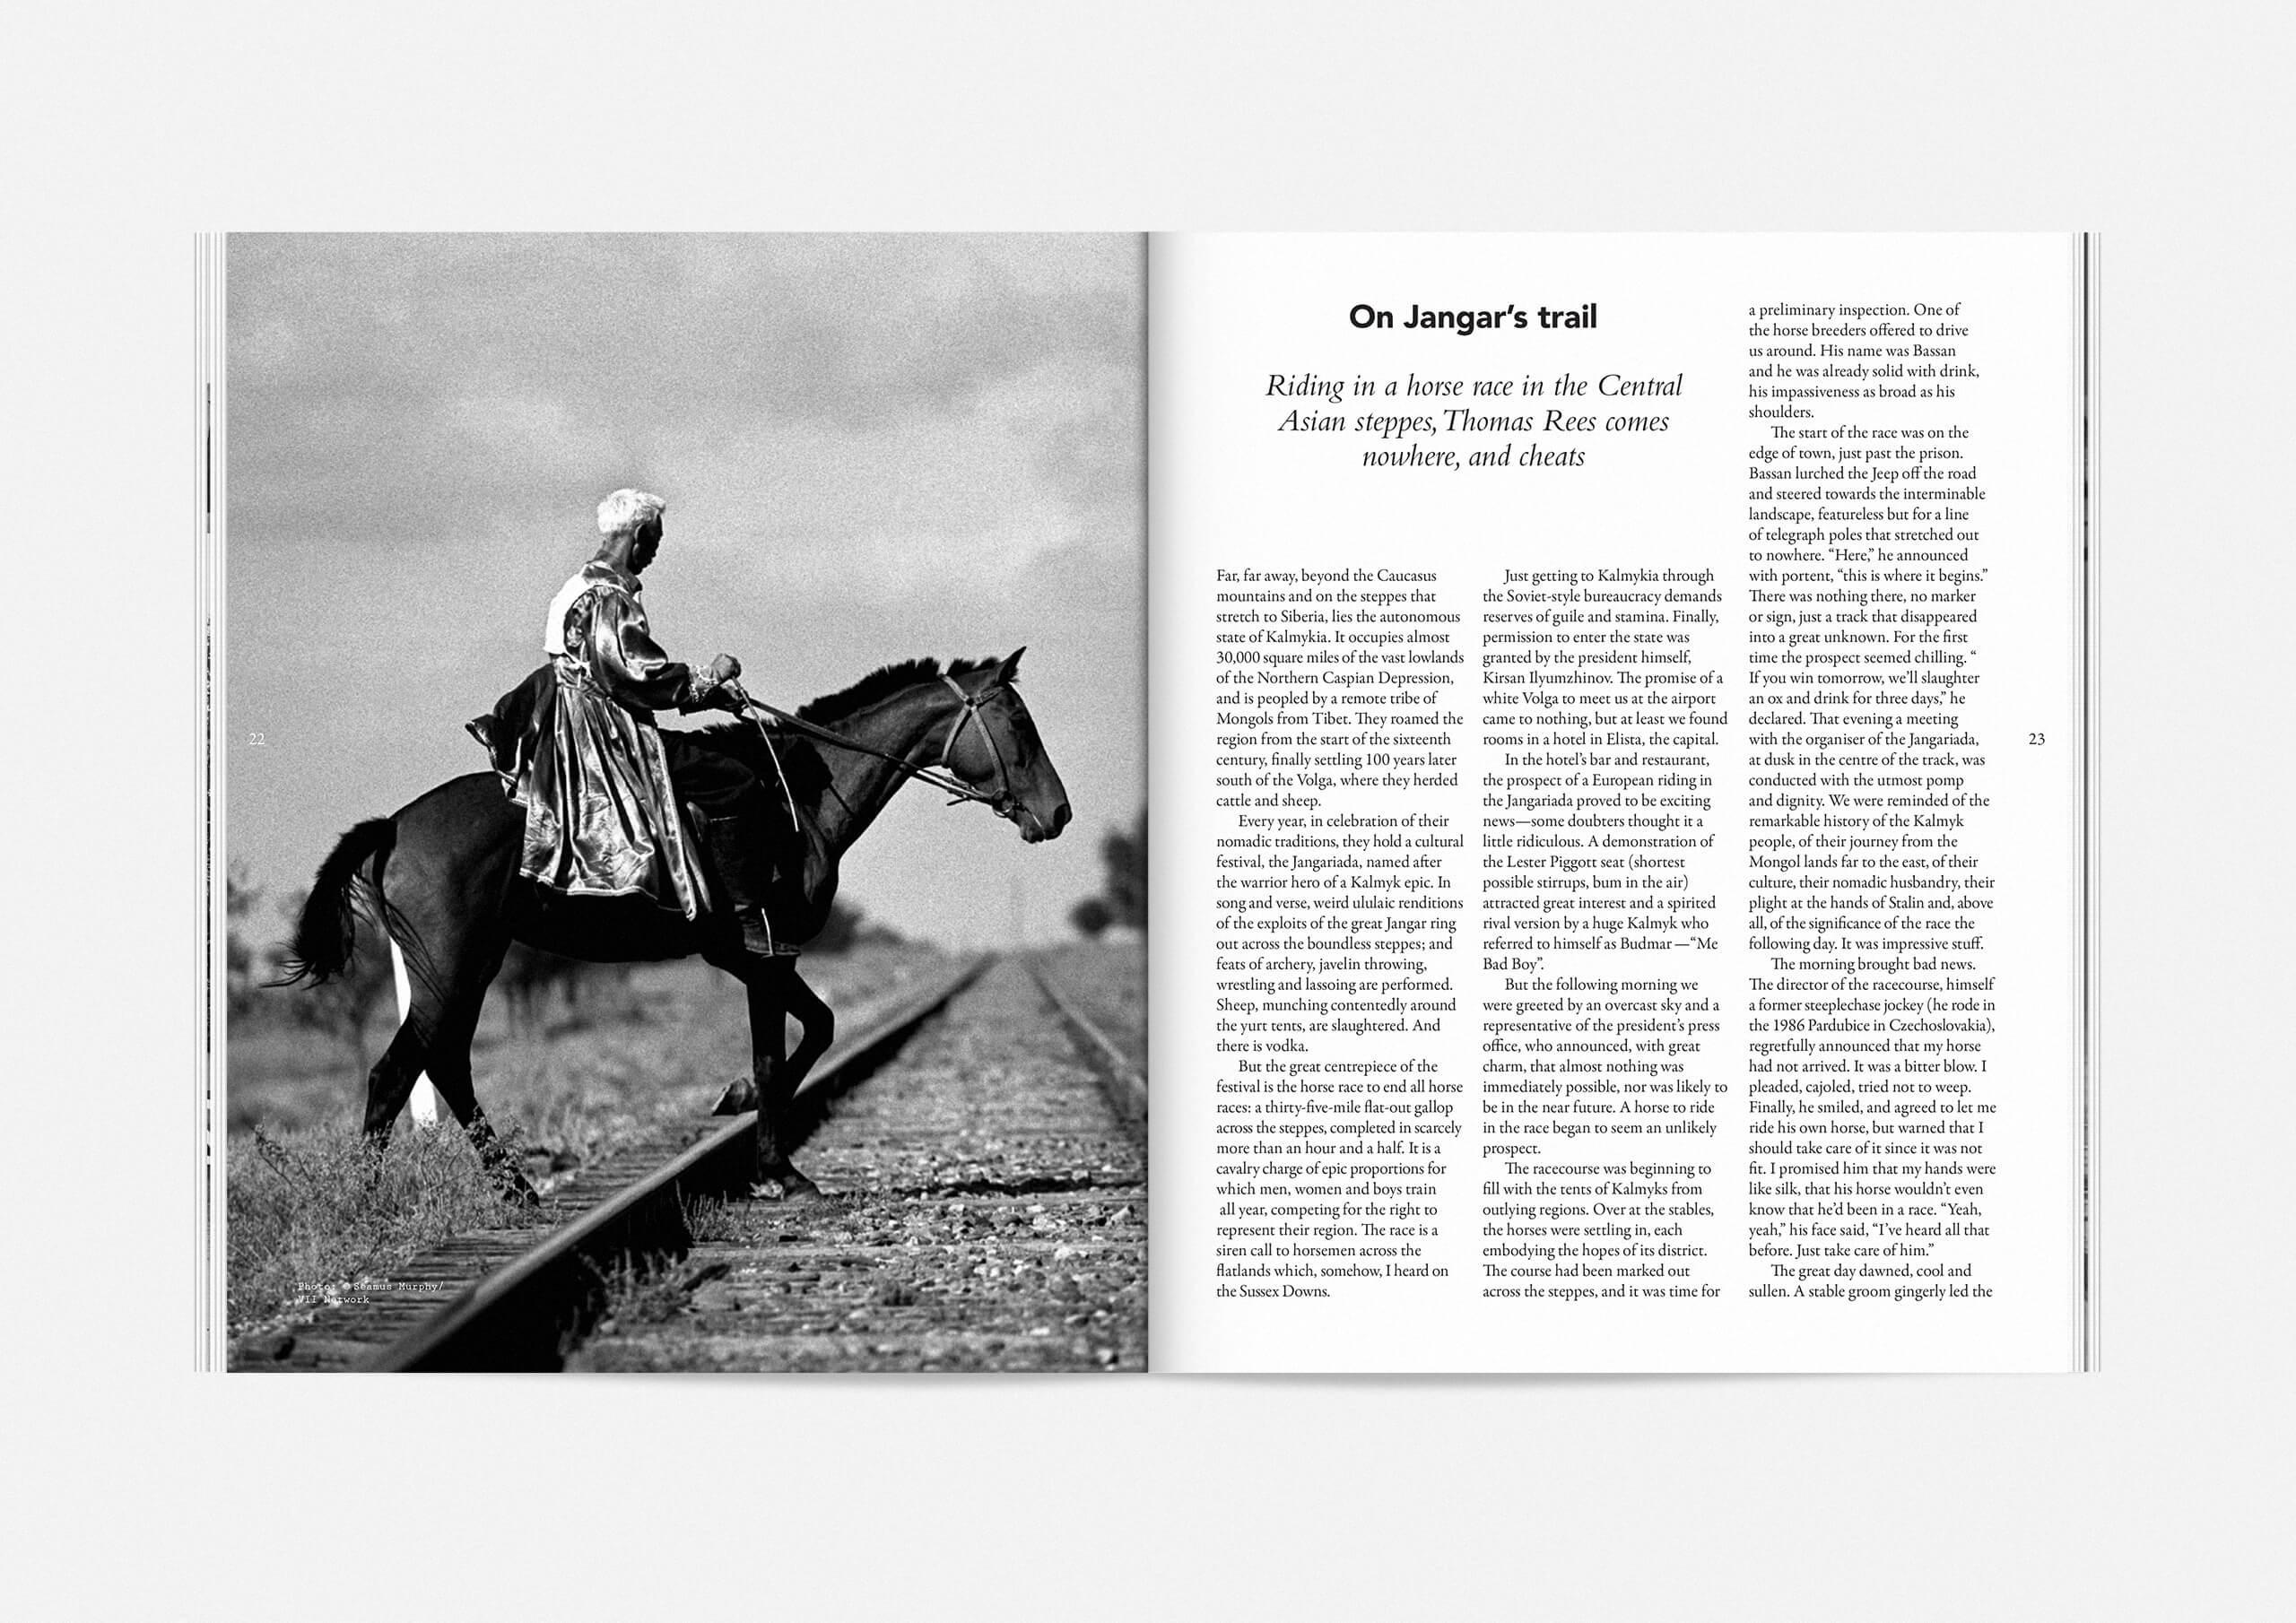 https://neuegestaltung.de/media/pages/clients/teller-magazine-issue-1/cfd865df81-1597415428/teller_issue_01_innenseite_22_23_ng.jpg